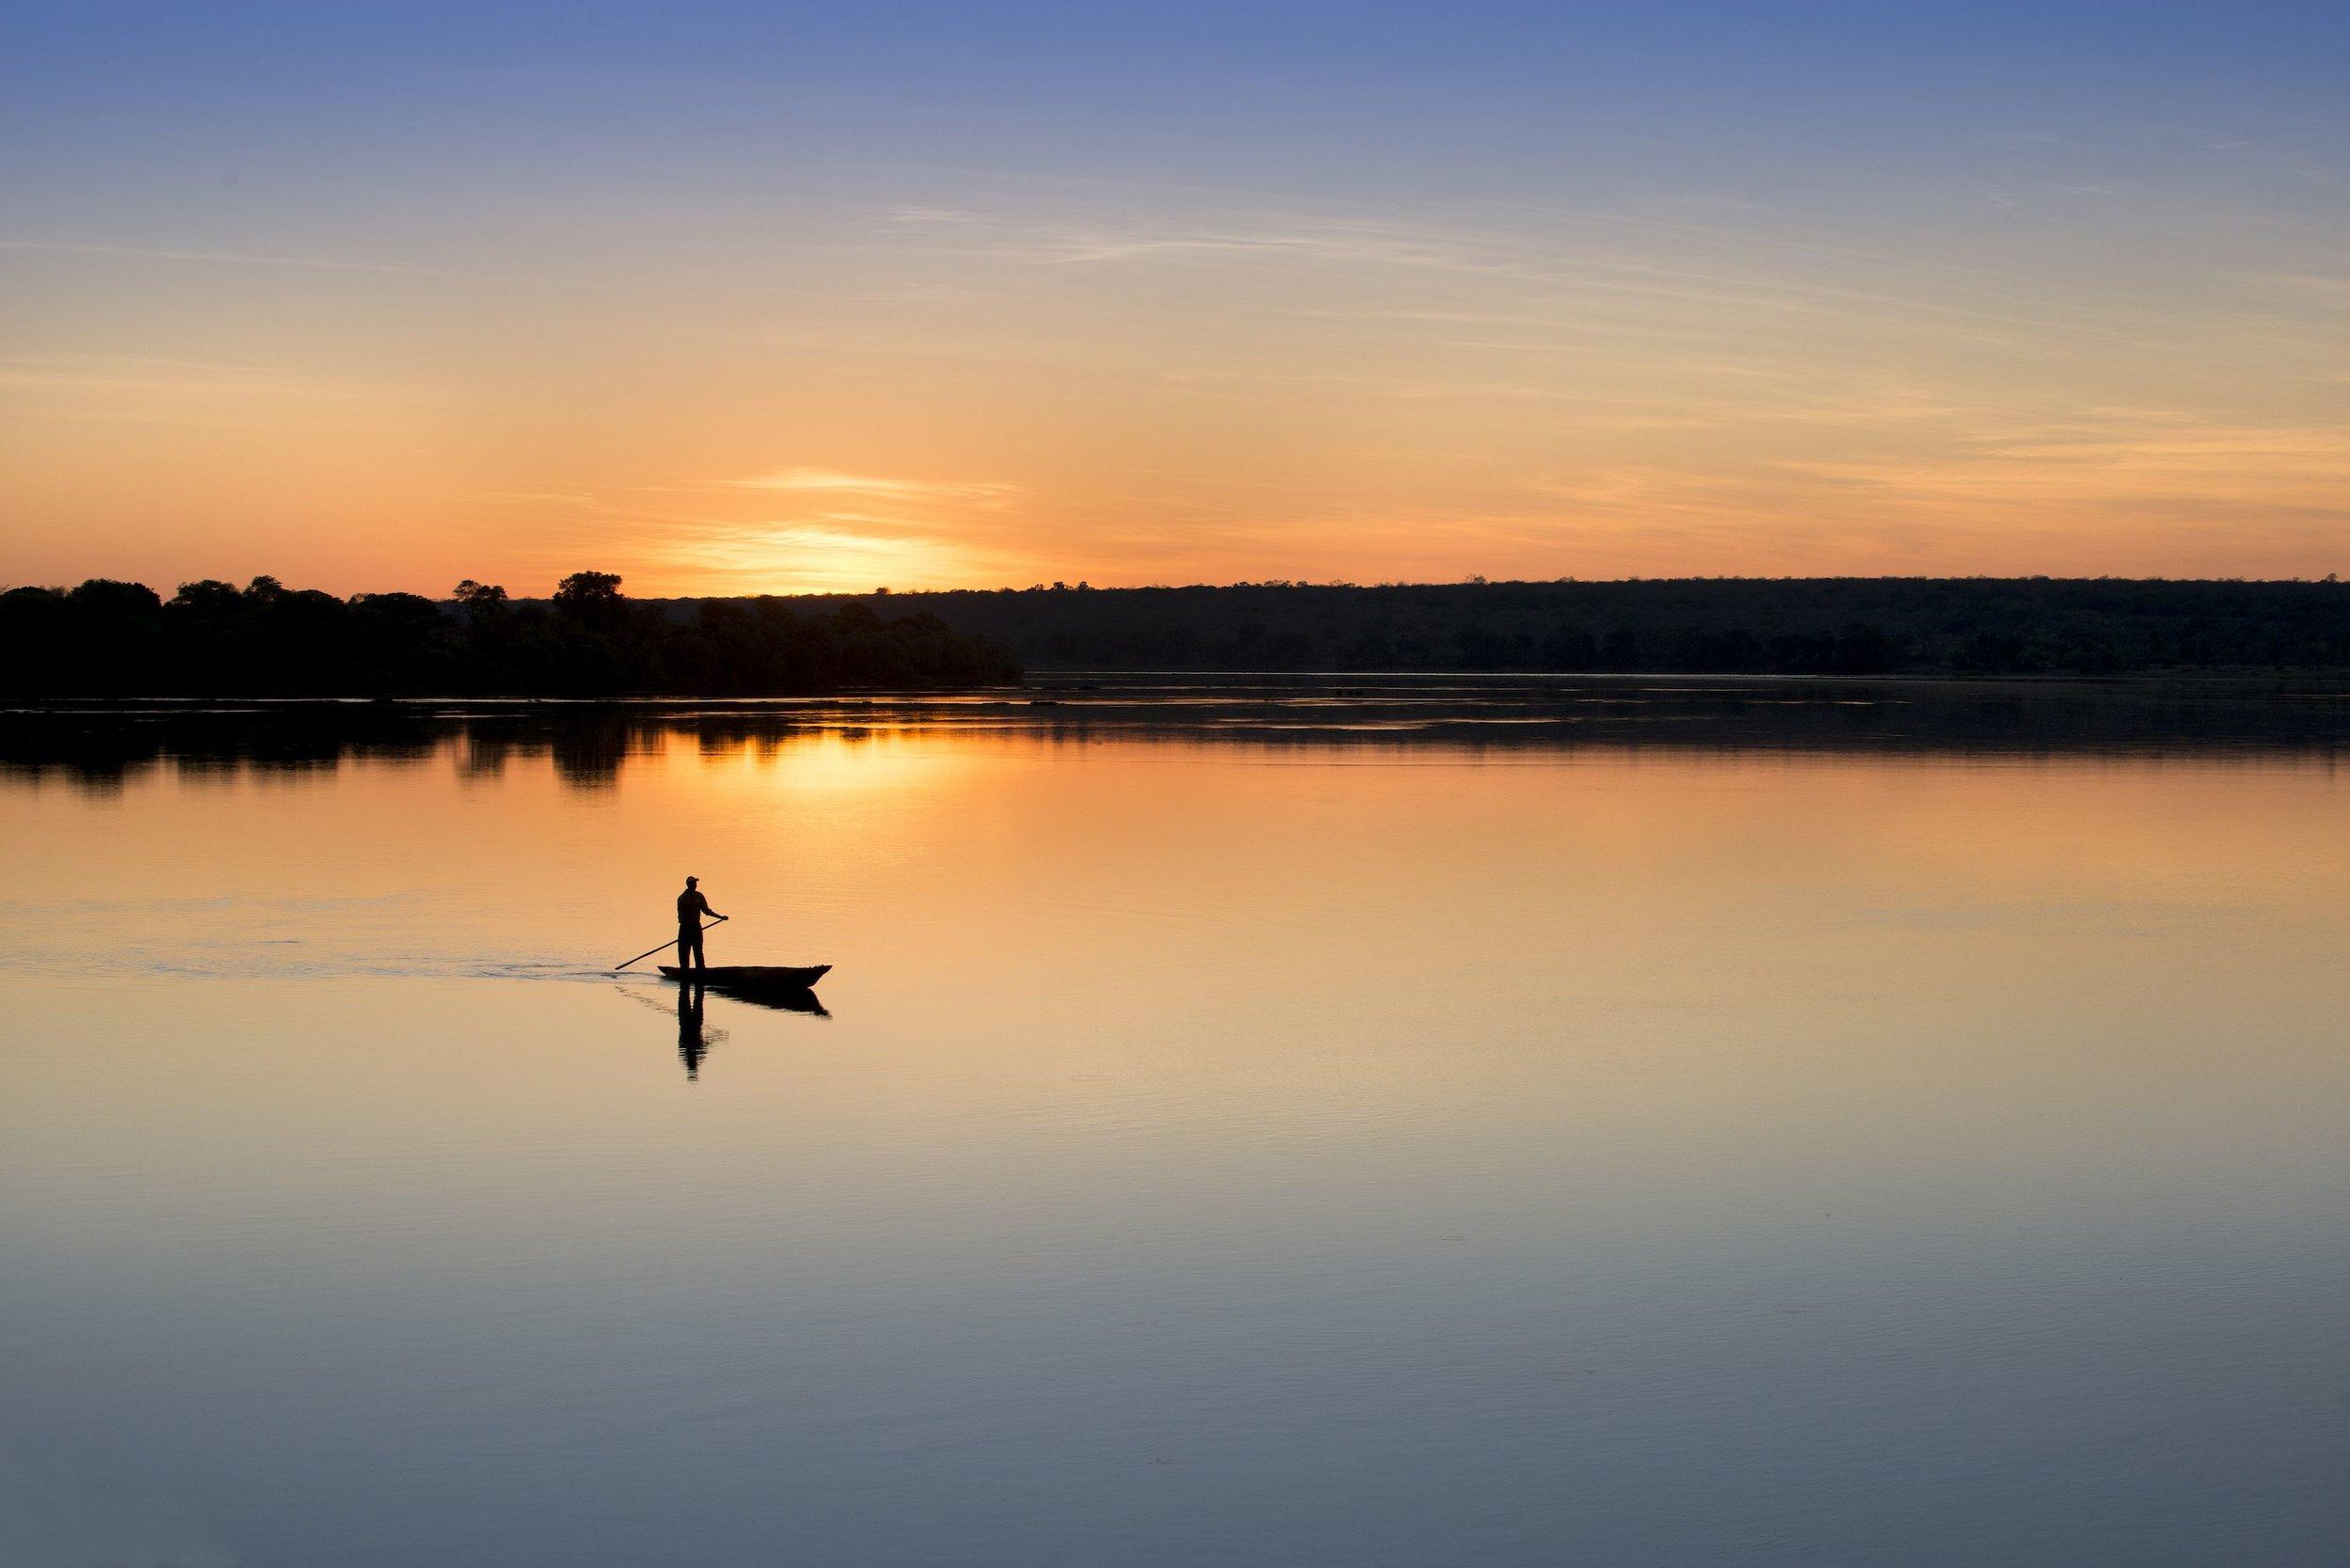 lrc_sunset_mokoro2.jpg